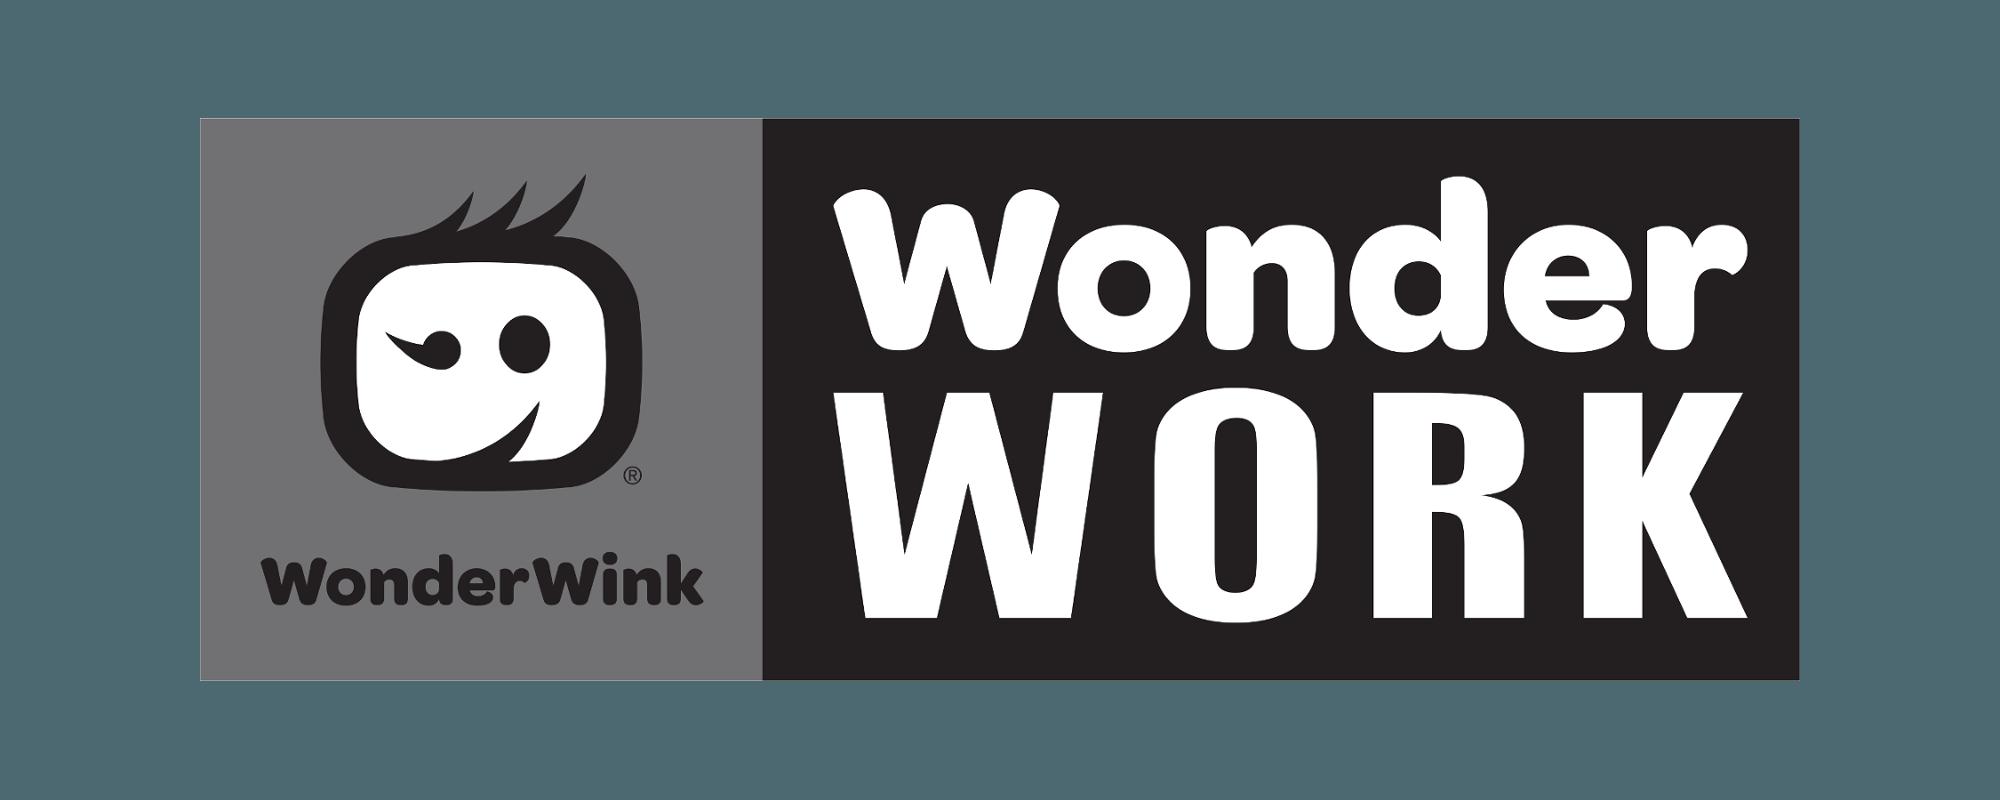 WonderWork